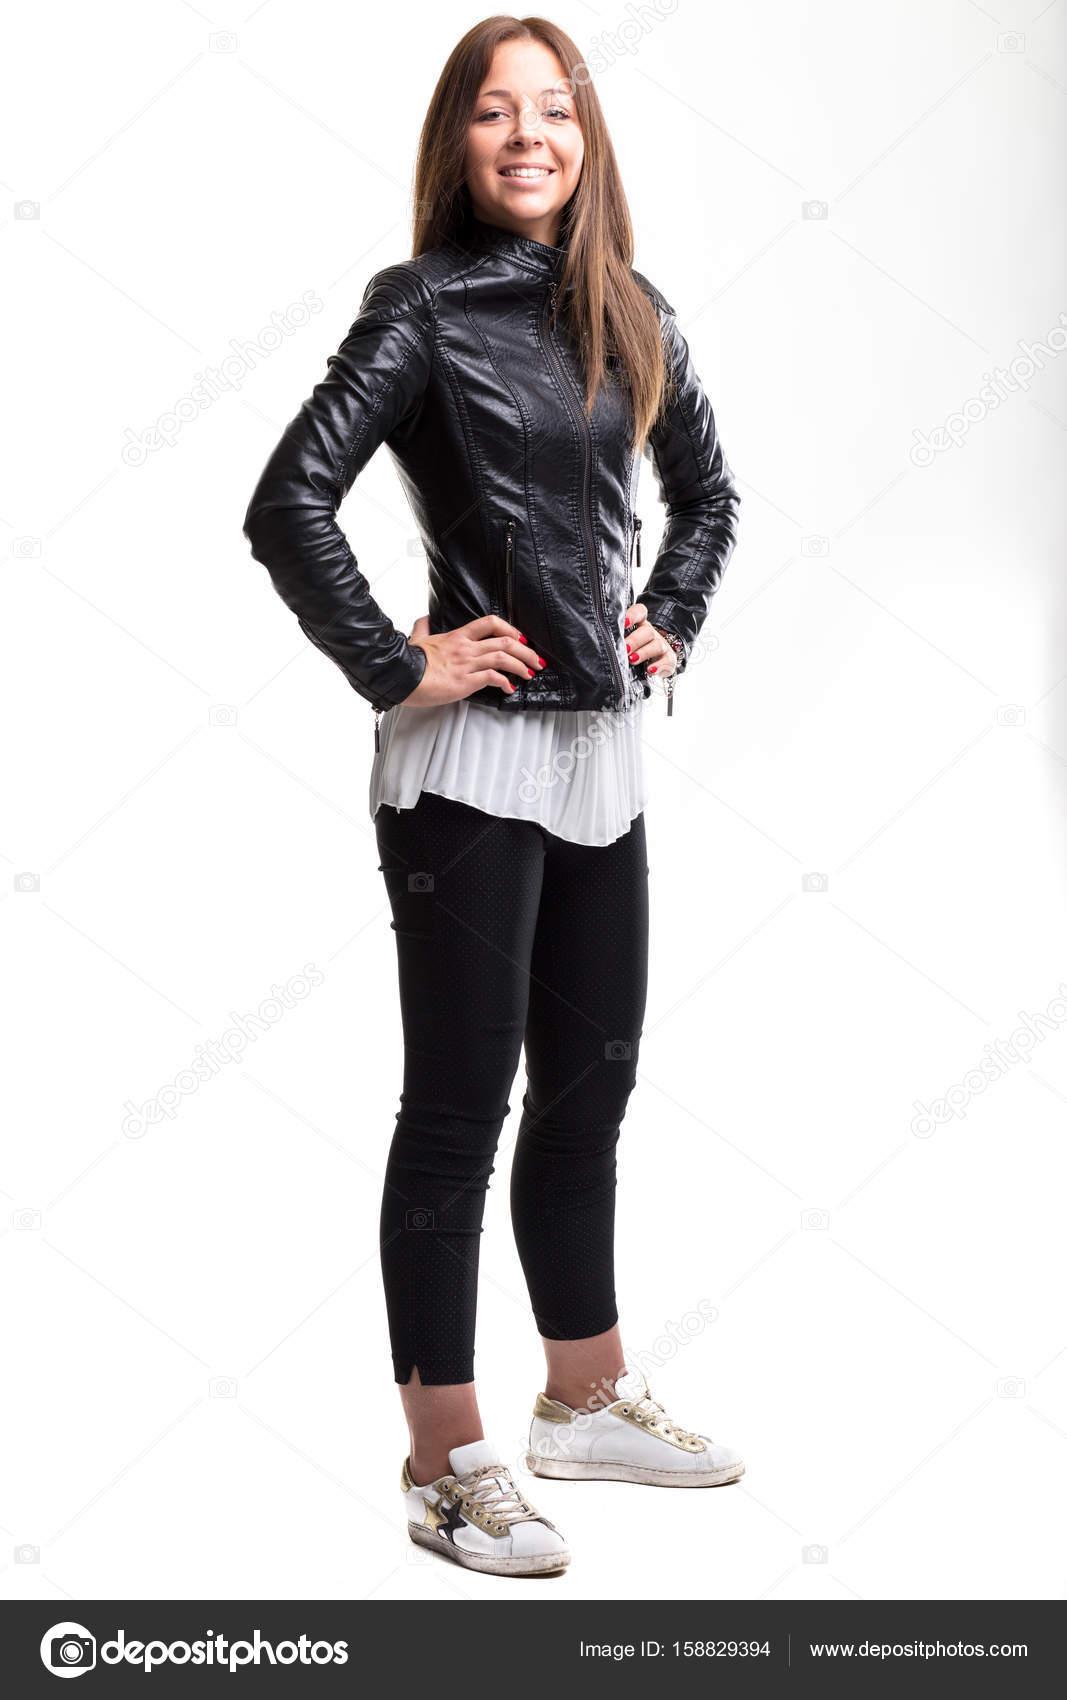 Tendance mode jeune femme